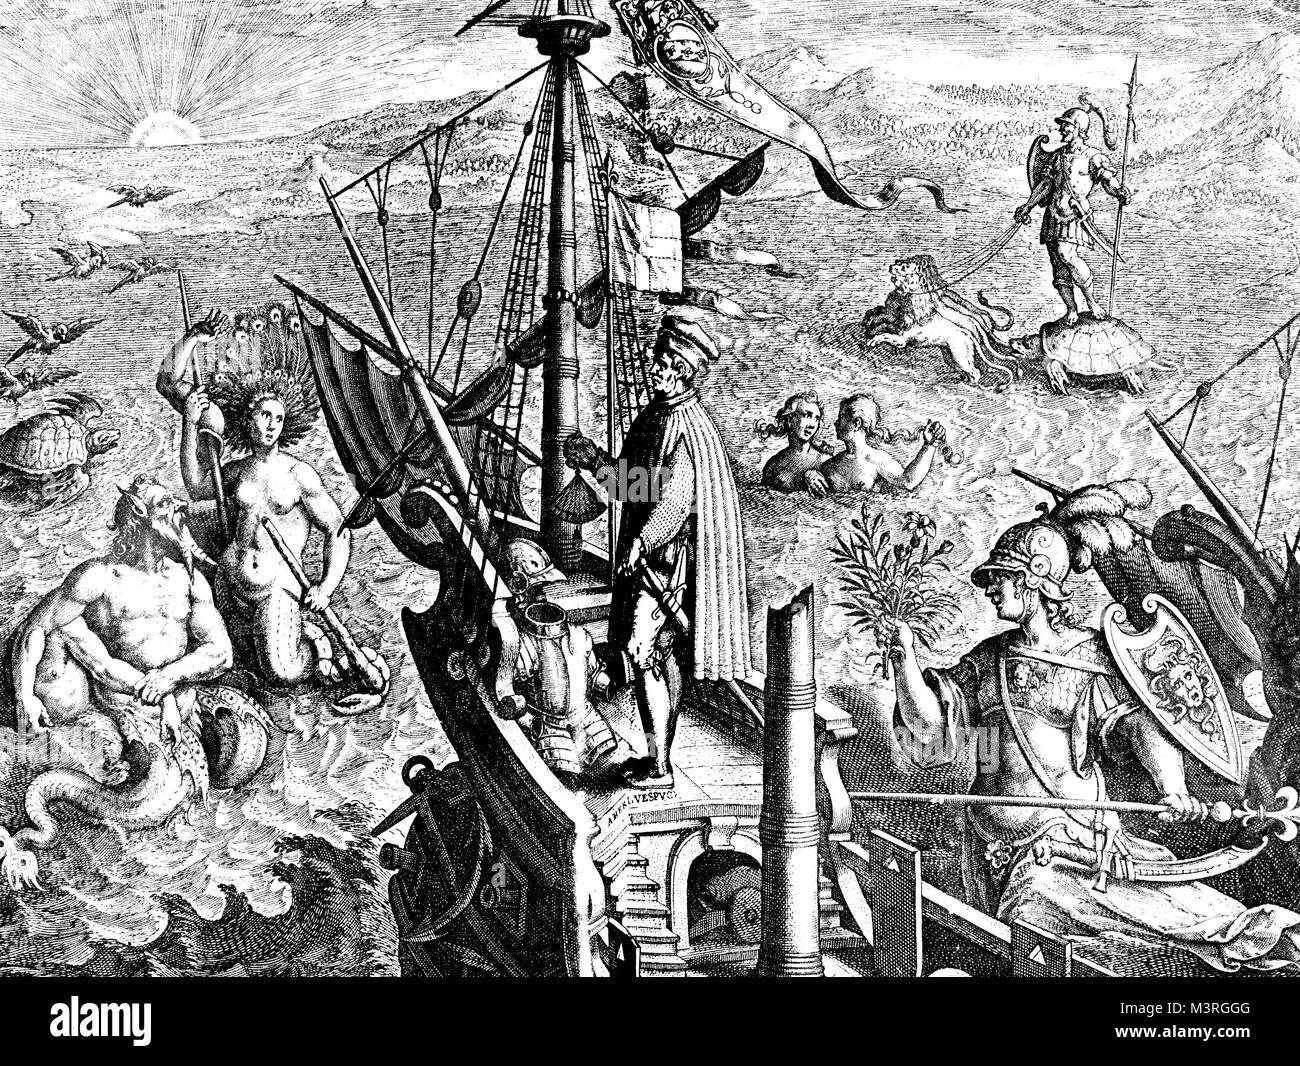 Allegory of America discovery from Amerigo Vespucci, XVI century illustration - Stock Image